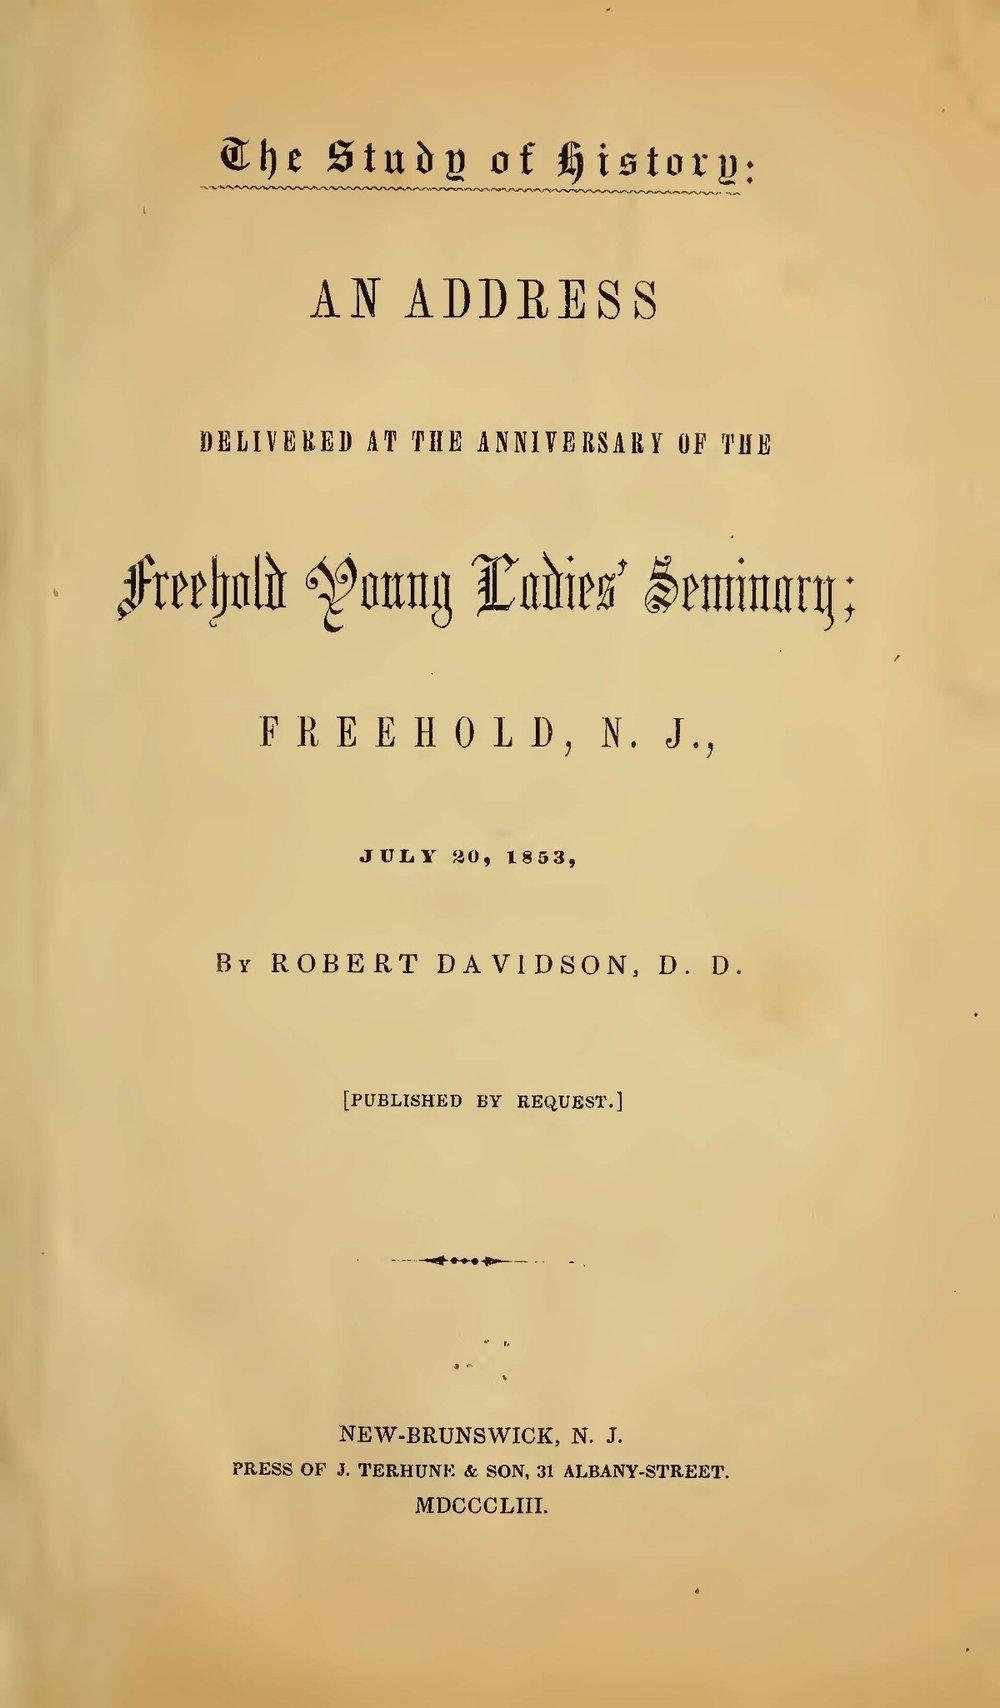 Davidson, Robert, The Study of History Title Page.jpg